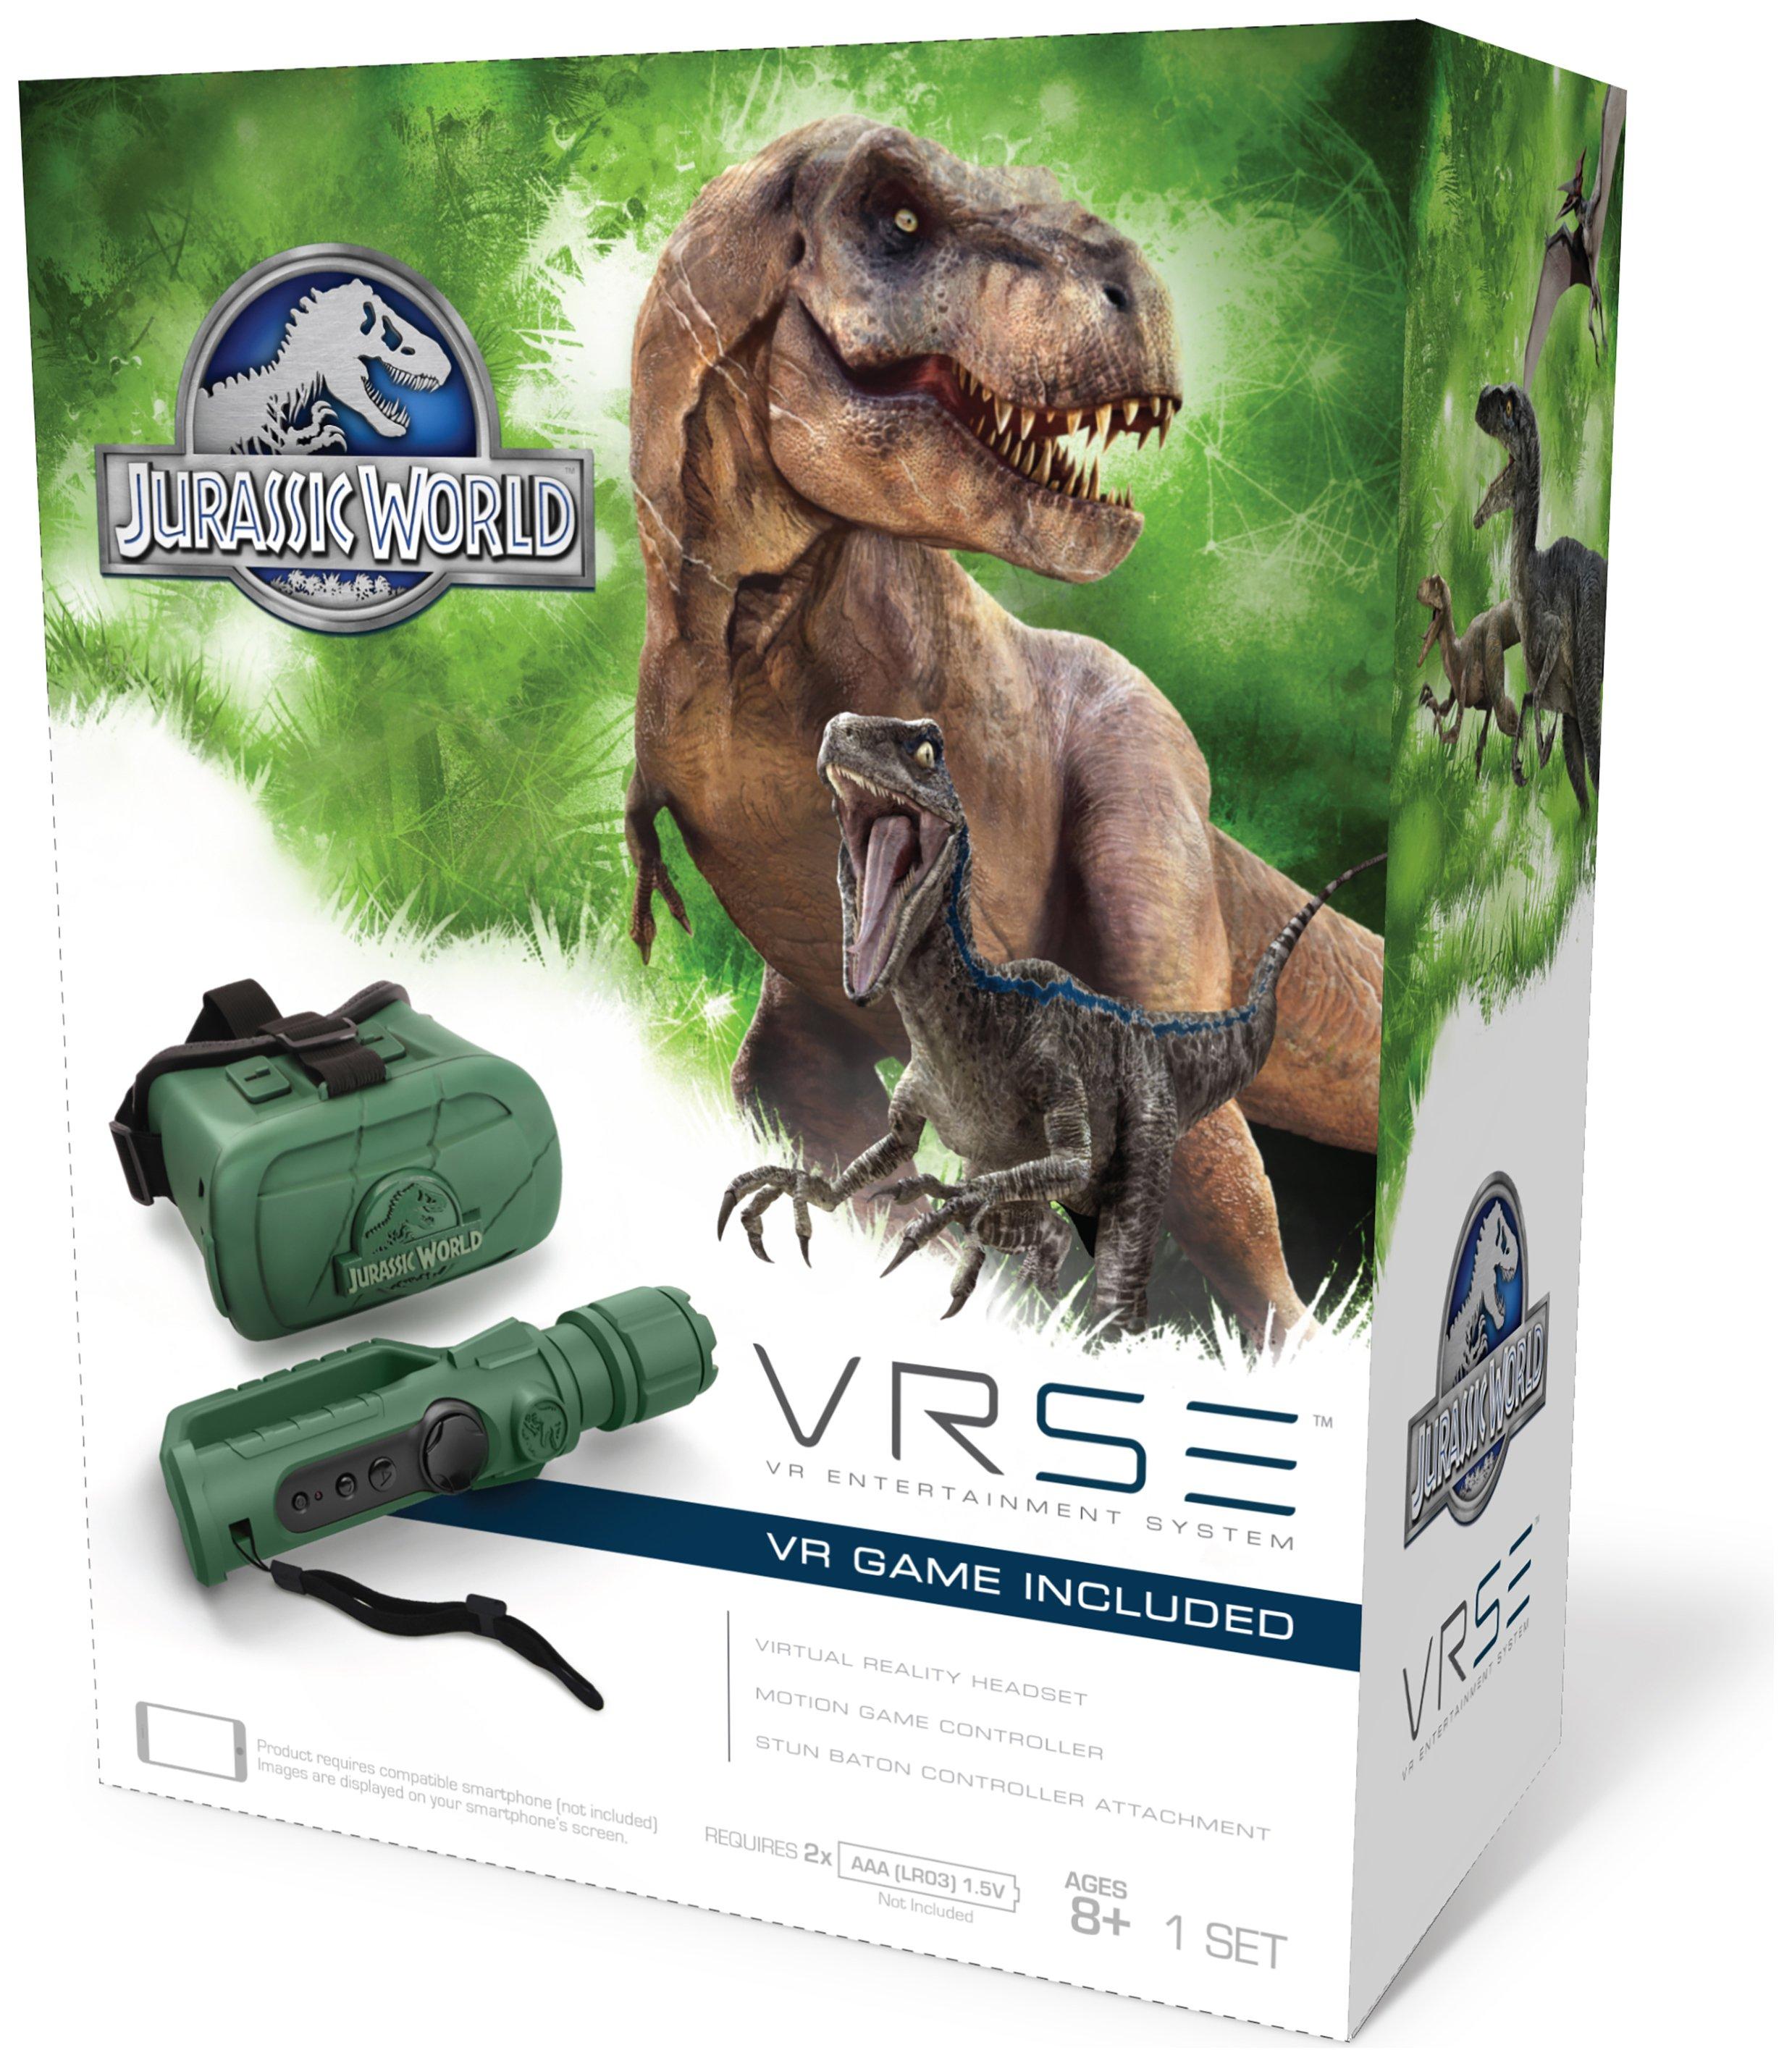 VRSE Jurassic World VR Headset and Game